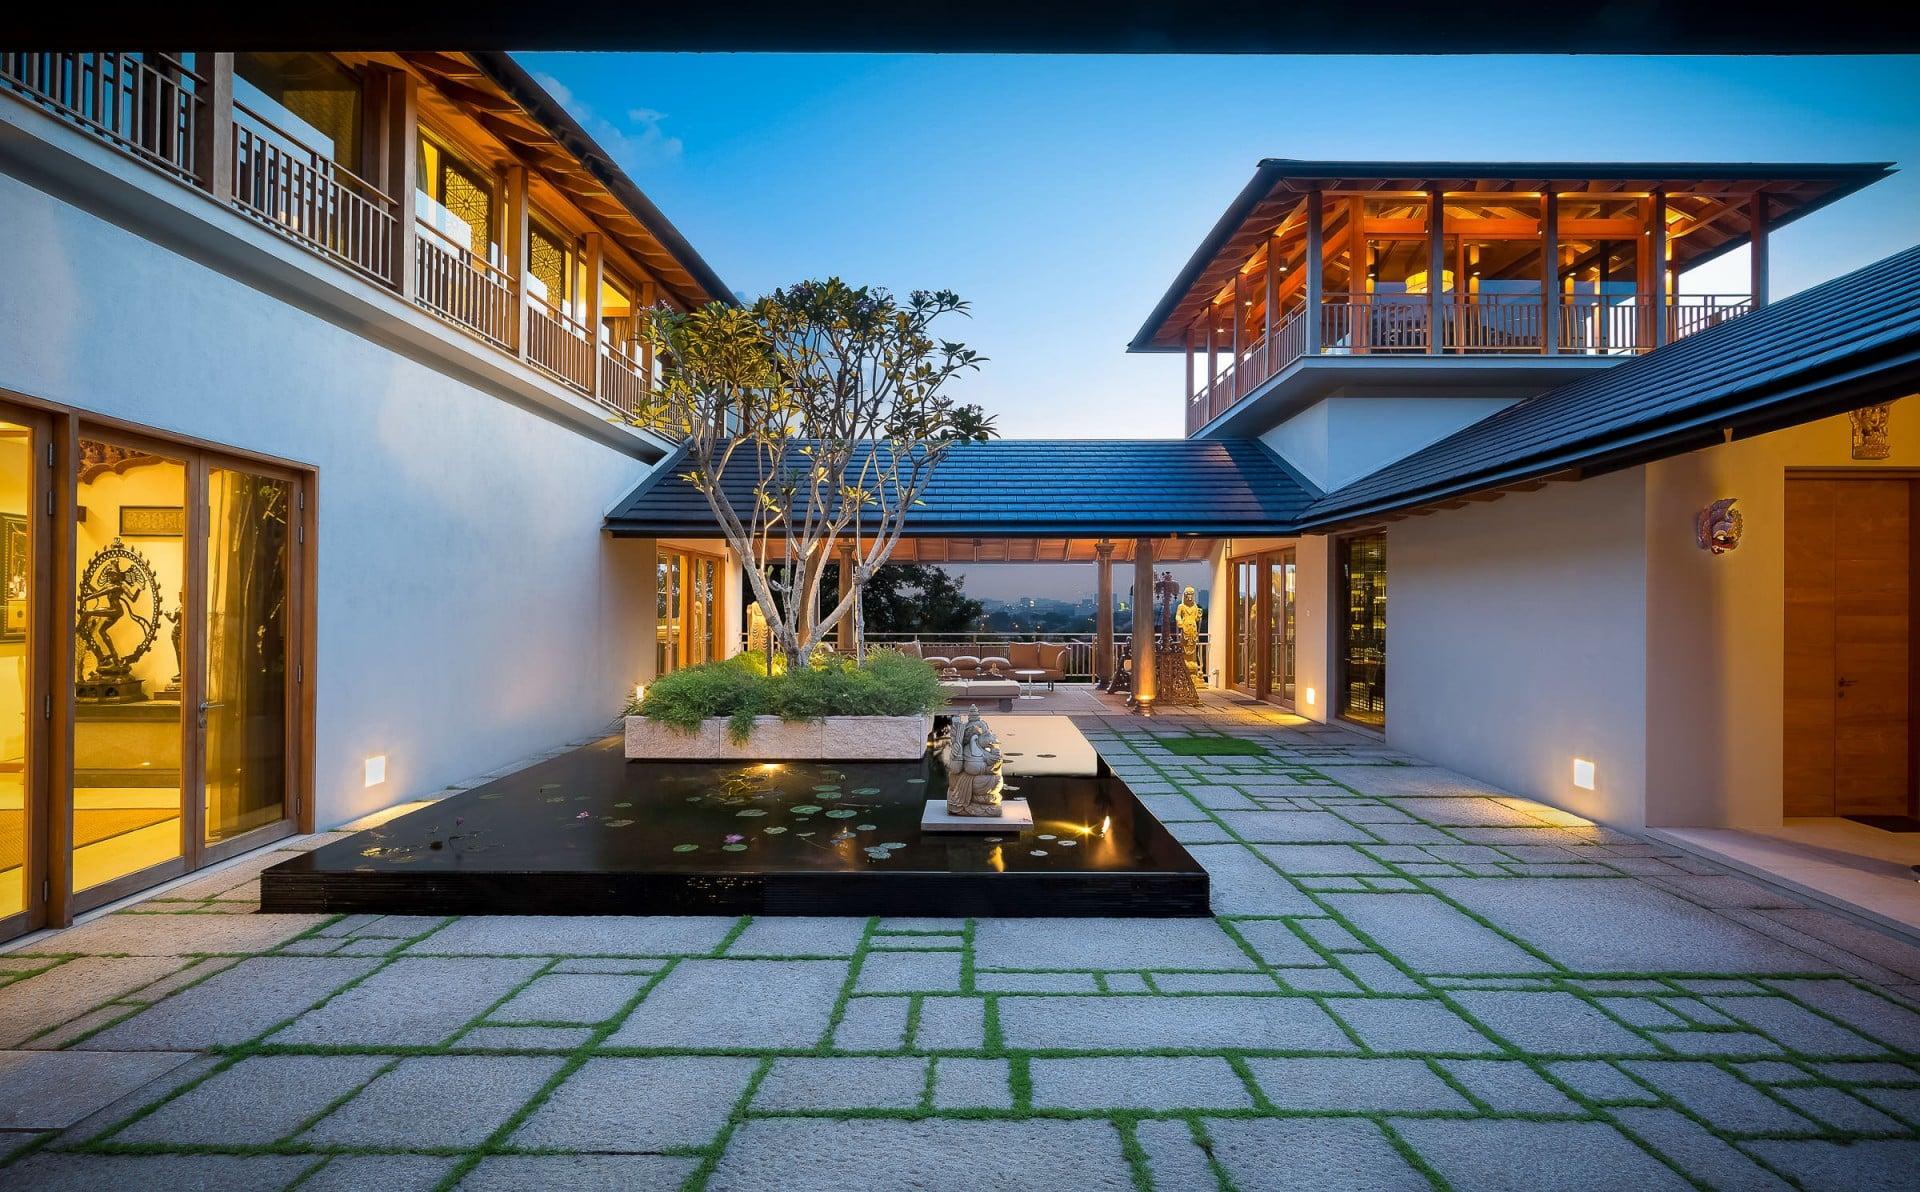 Best Architecture Photographer Kuala Lumpur | Luxury Home Courtyard Photography Malaysia